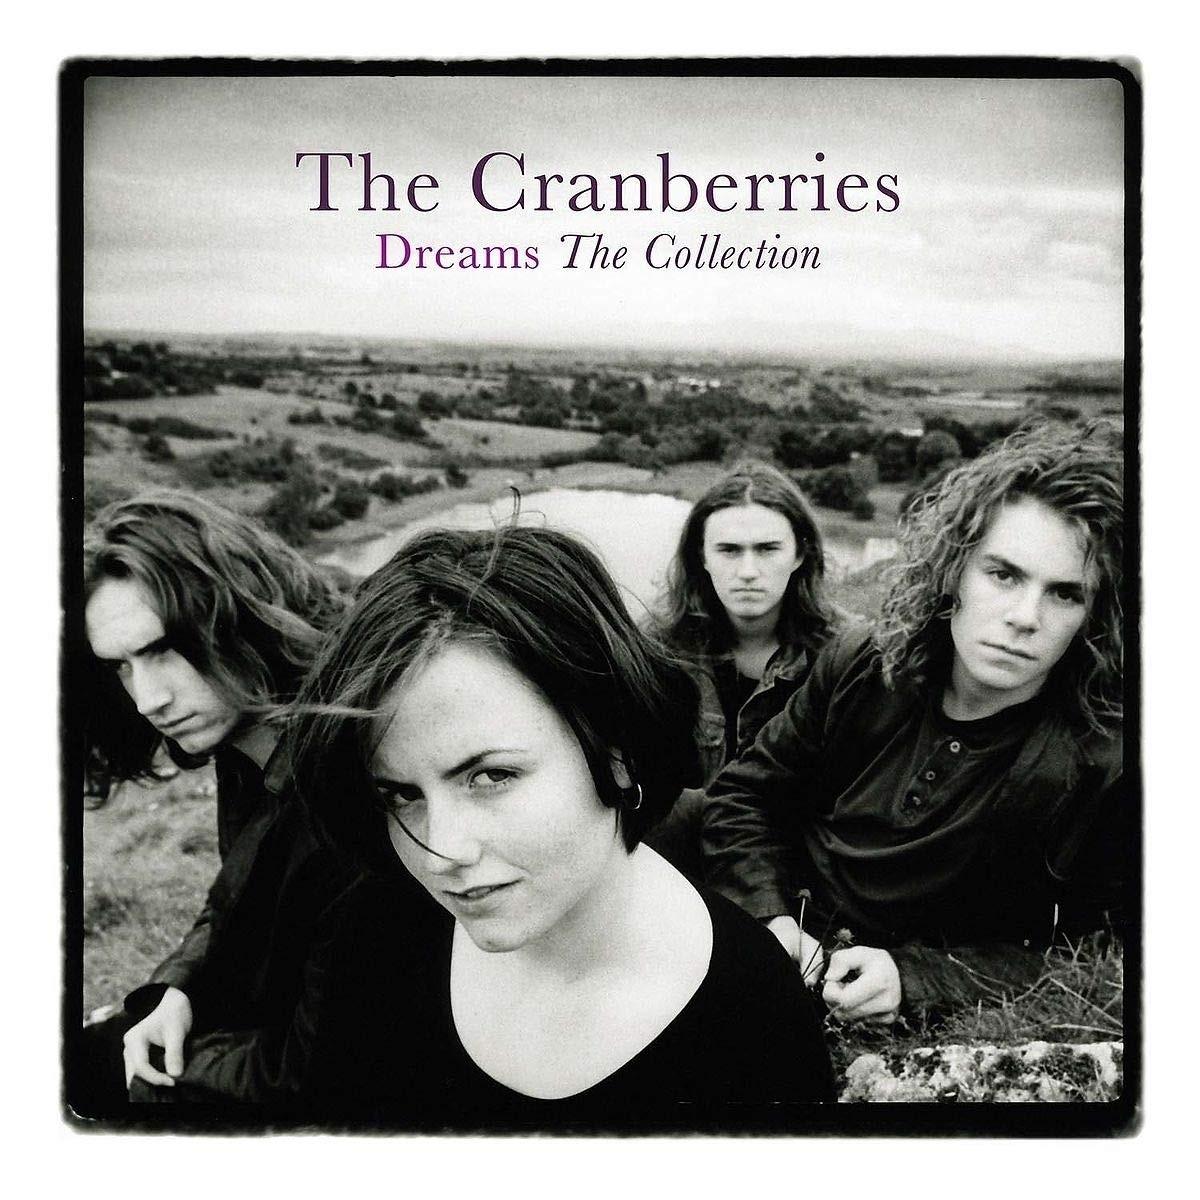 The Cranberries -  Dreams: The Collection Vinyl LP